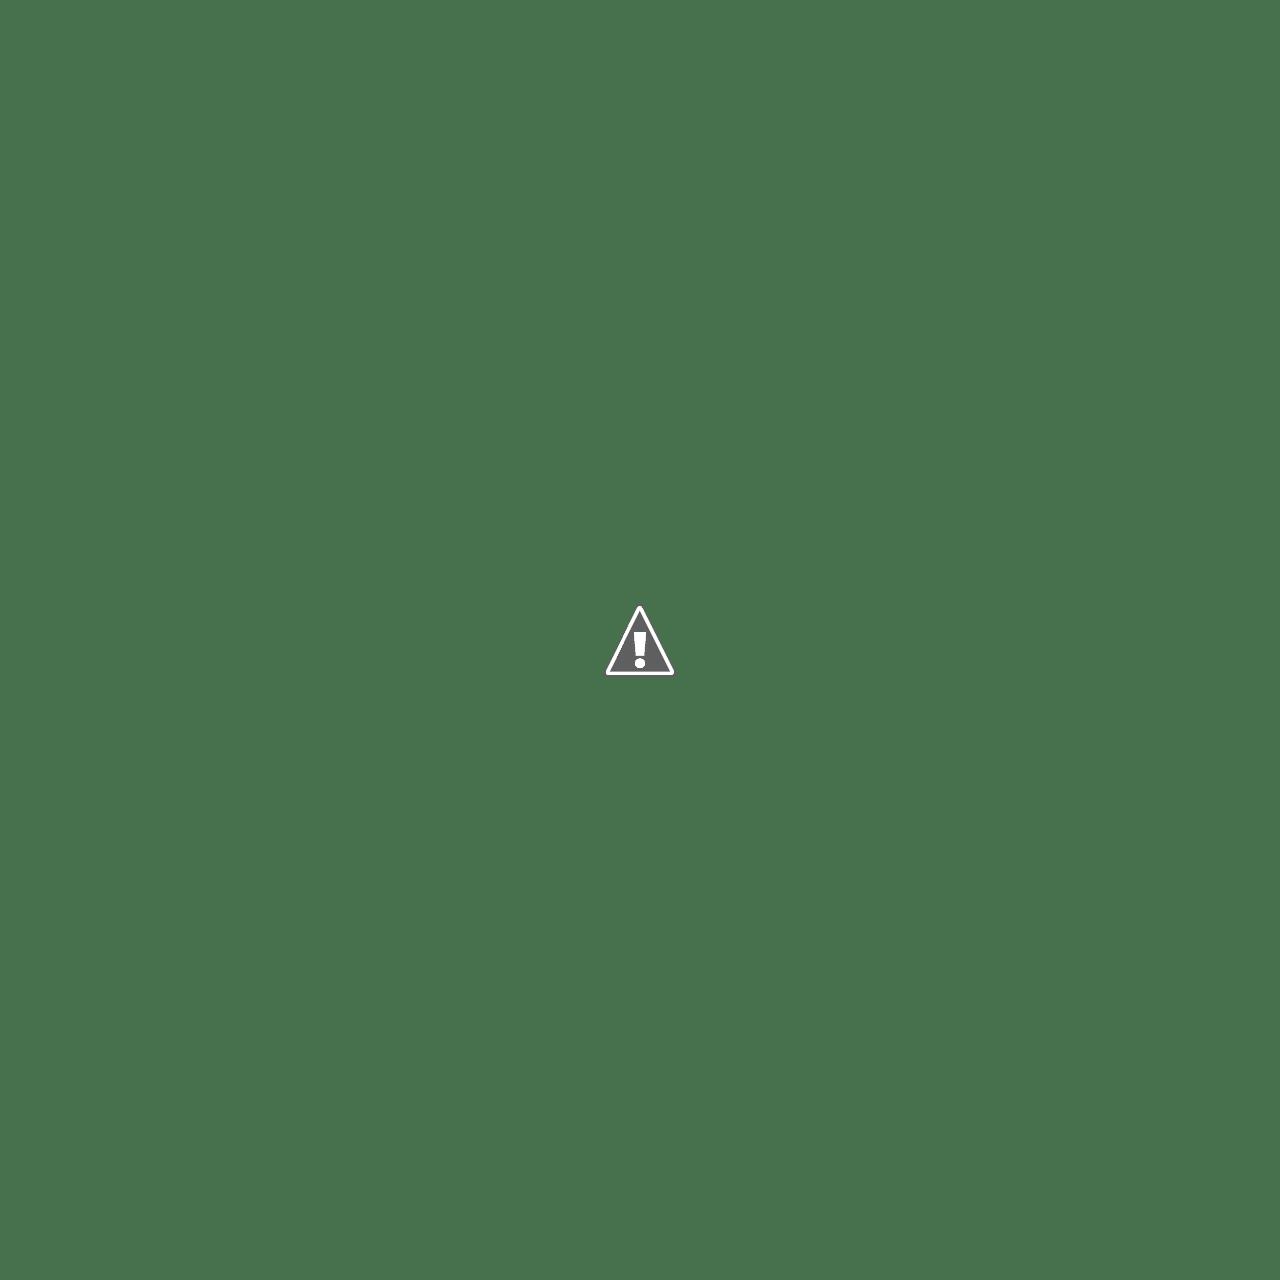 Standard Control Panel Pvt Ltd Pcc Mcc Amf Apfc Sdb Electrical Panels Updates Posted On Jun 26 2017